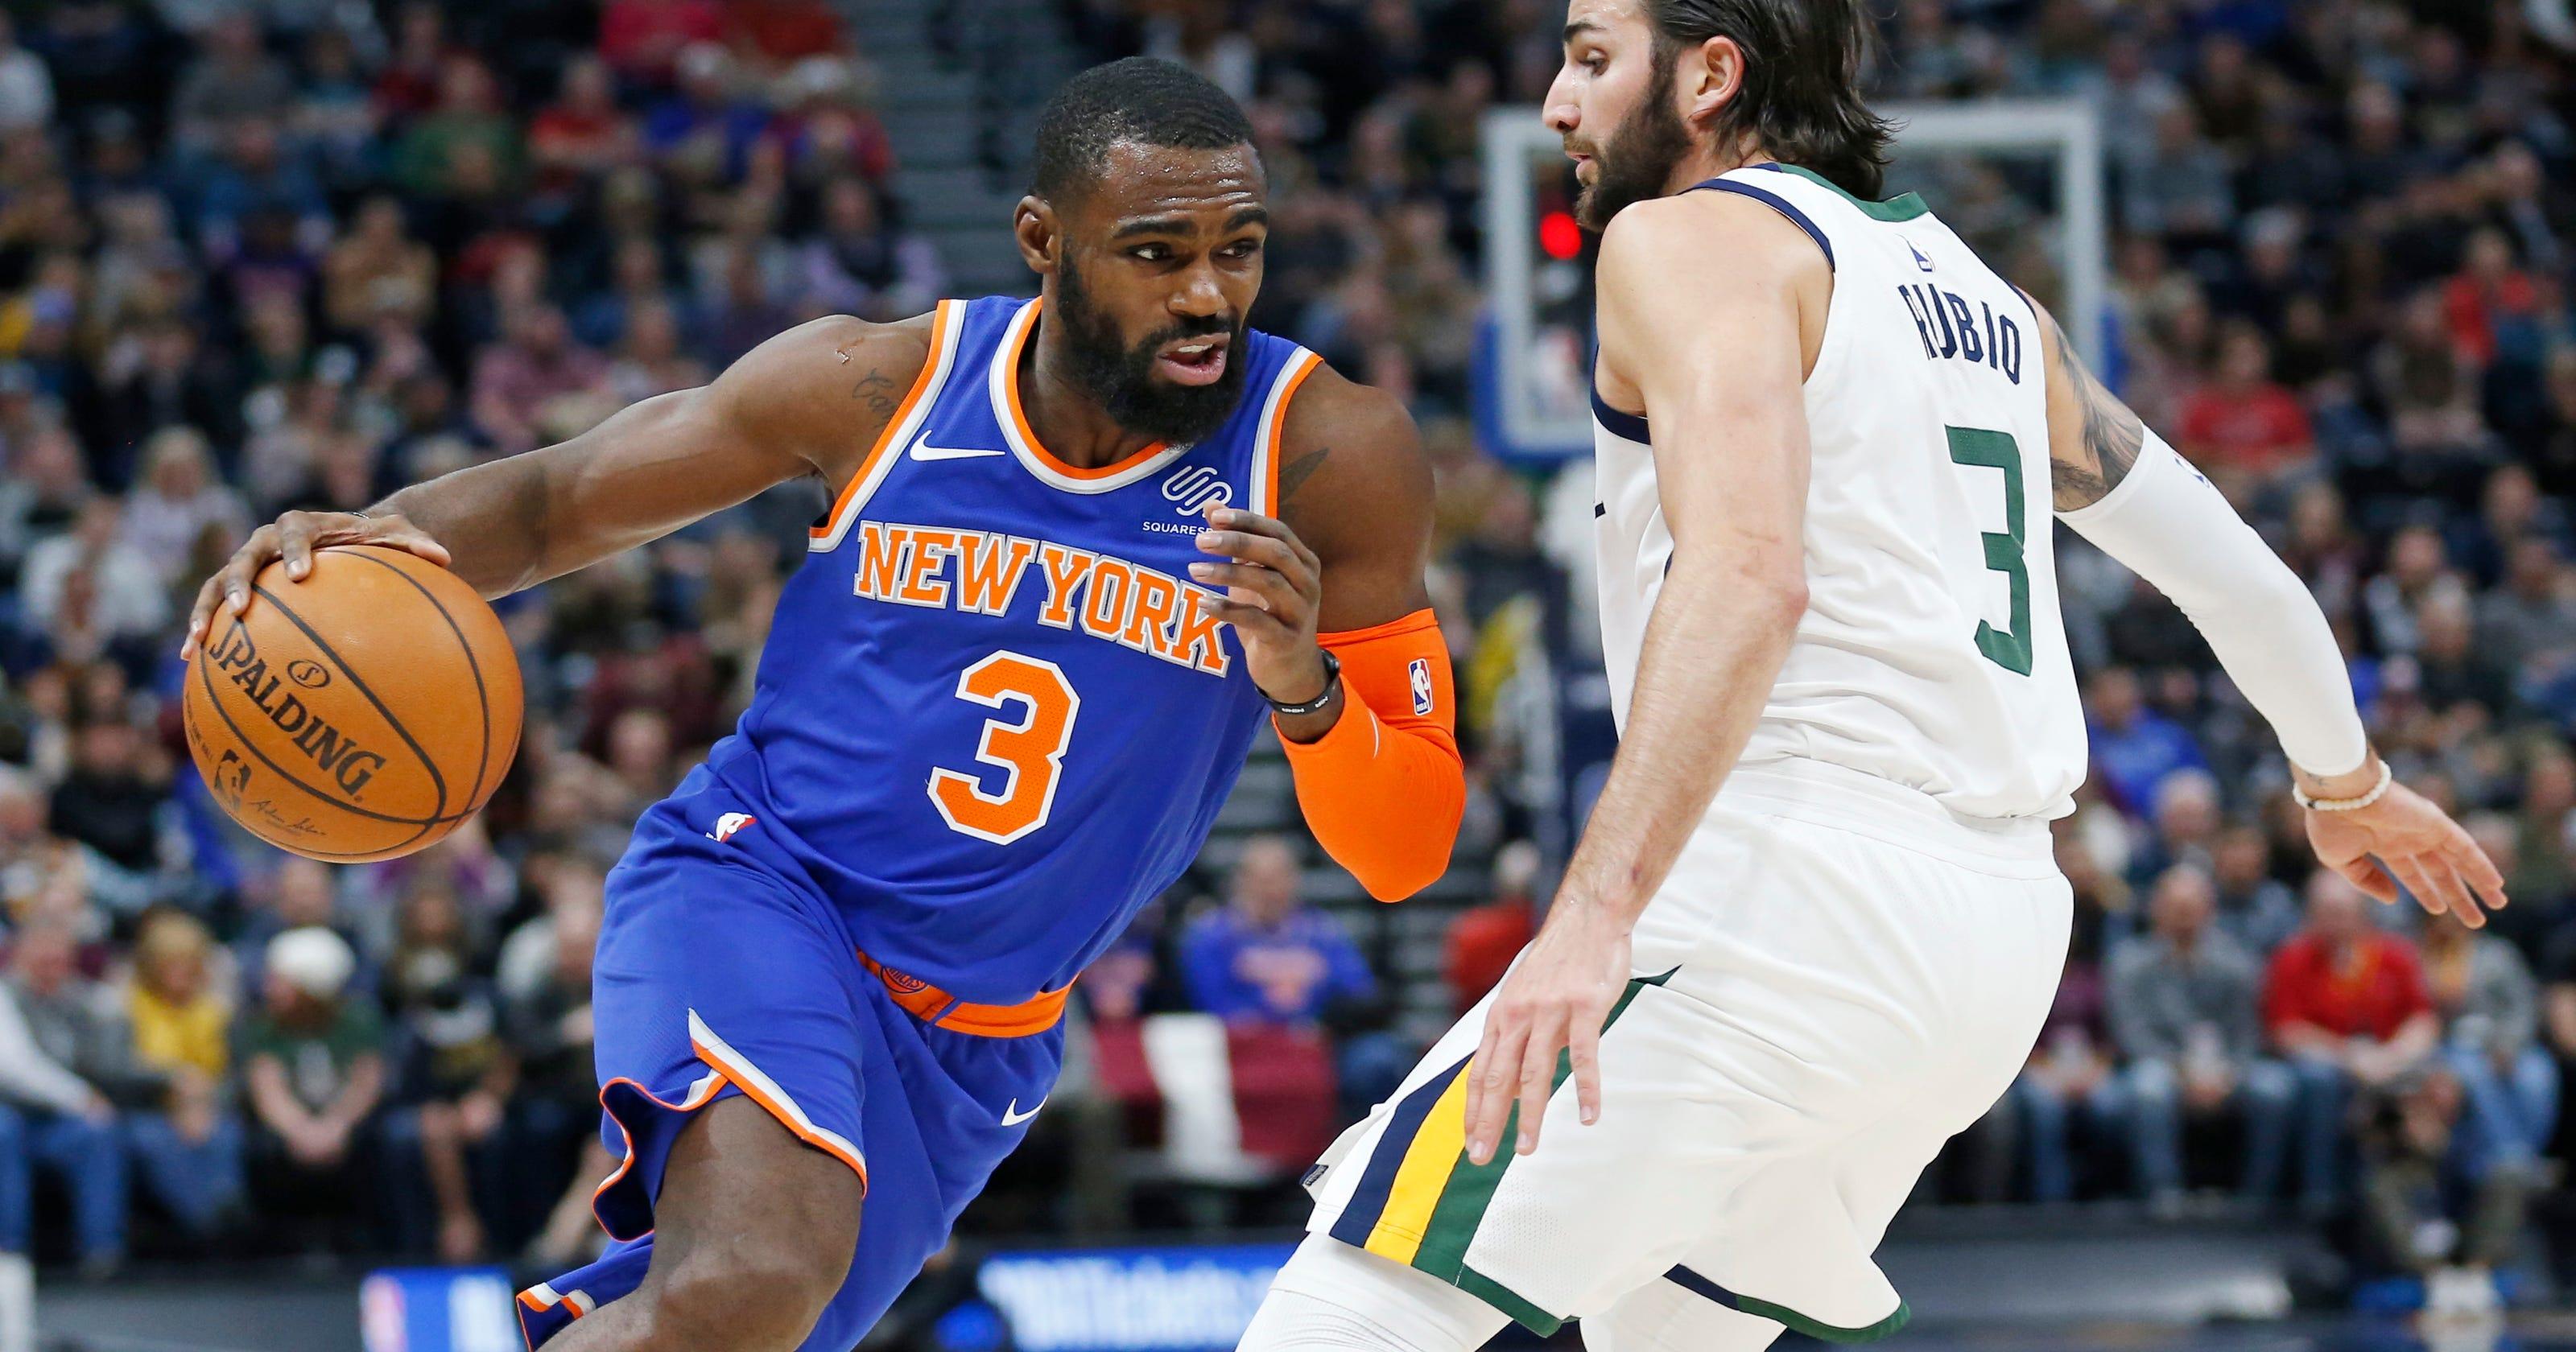 official photos 7b958 b7dcc New York Knicks' Tim Hardaway Jr. pushing for playoffs